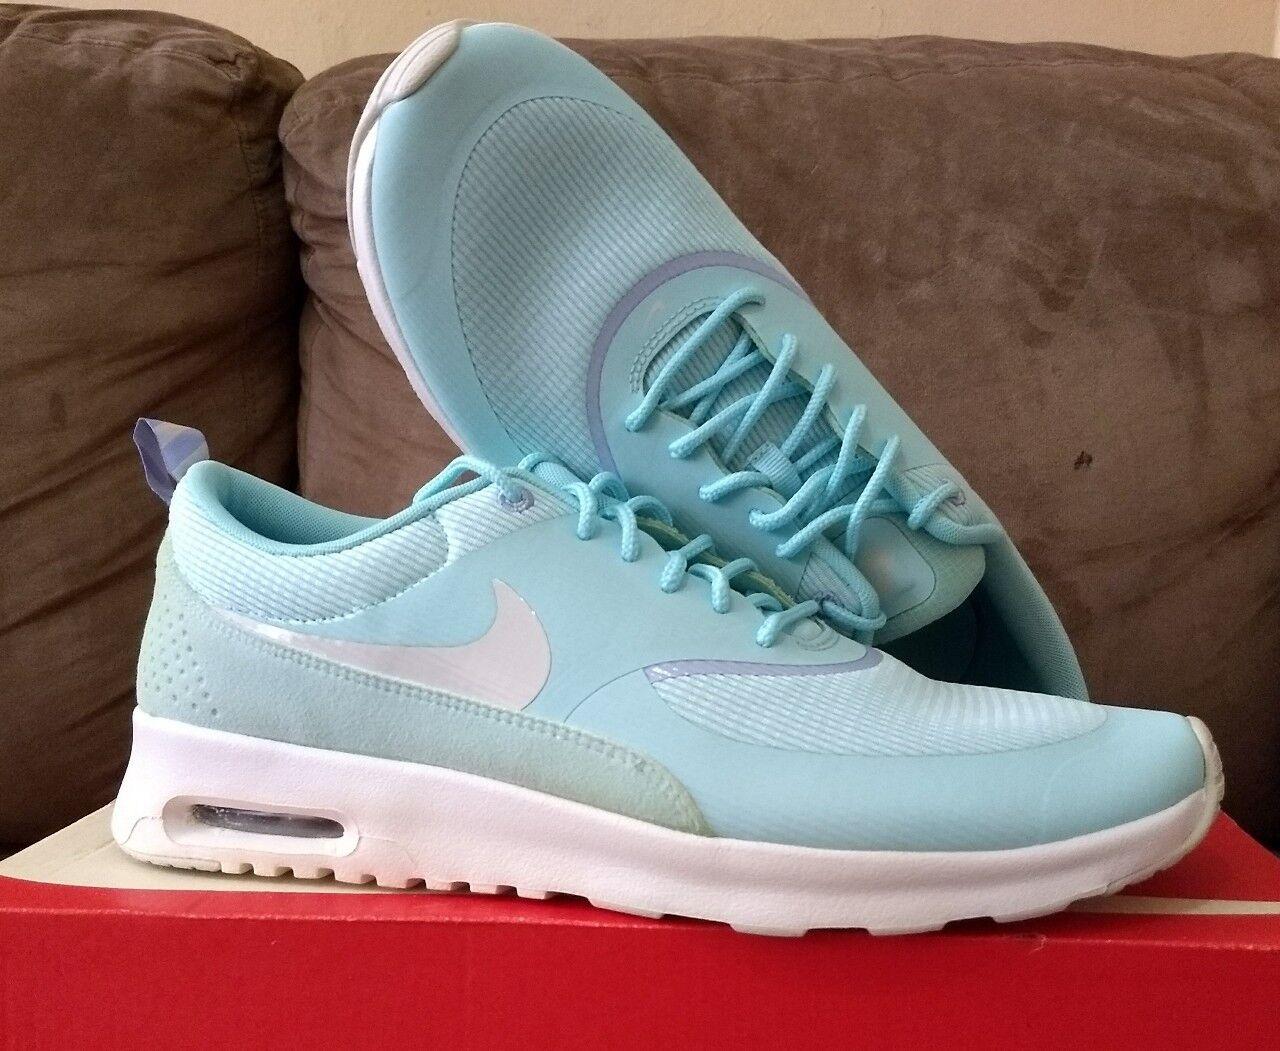 a61487863c690 Nike Nike Nike Free TR Focus Flyknit Women s Running Shoe 844817 001 Size  5.5 9f6f33 ...